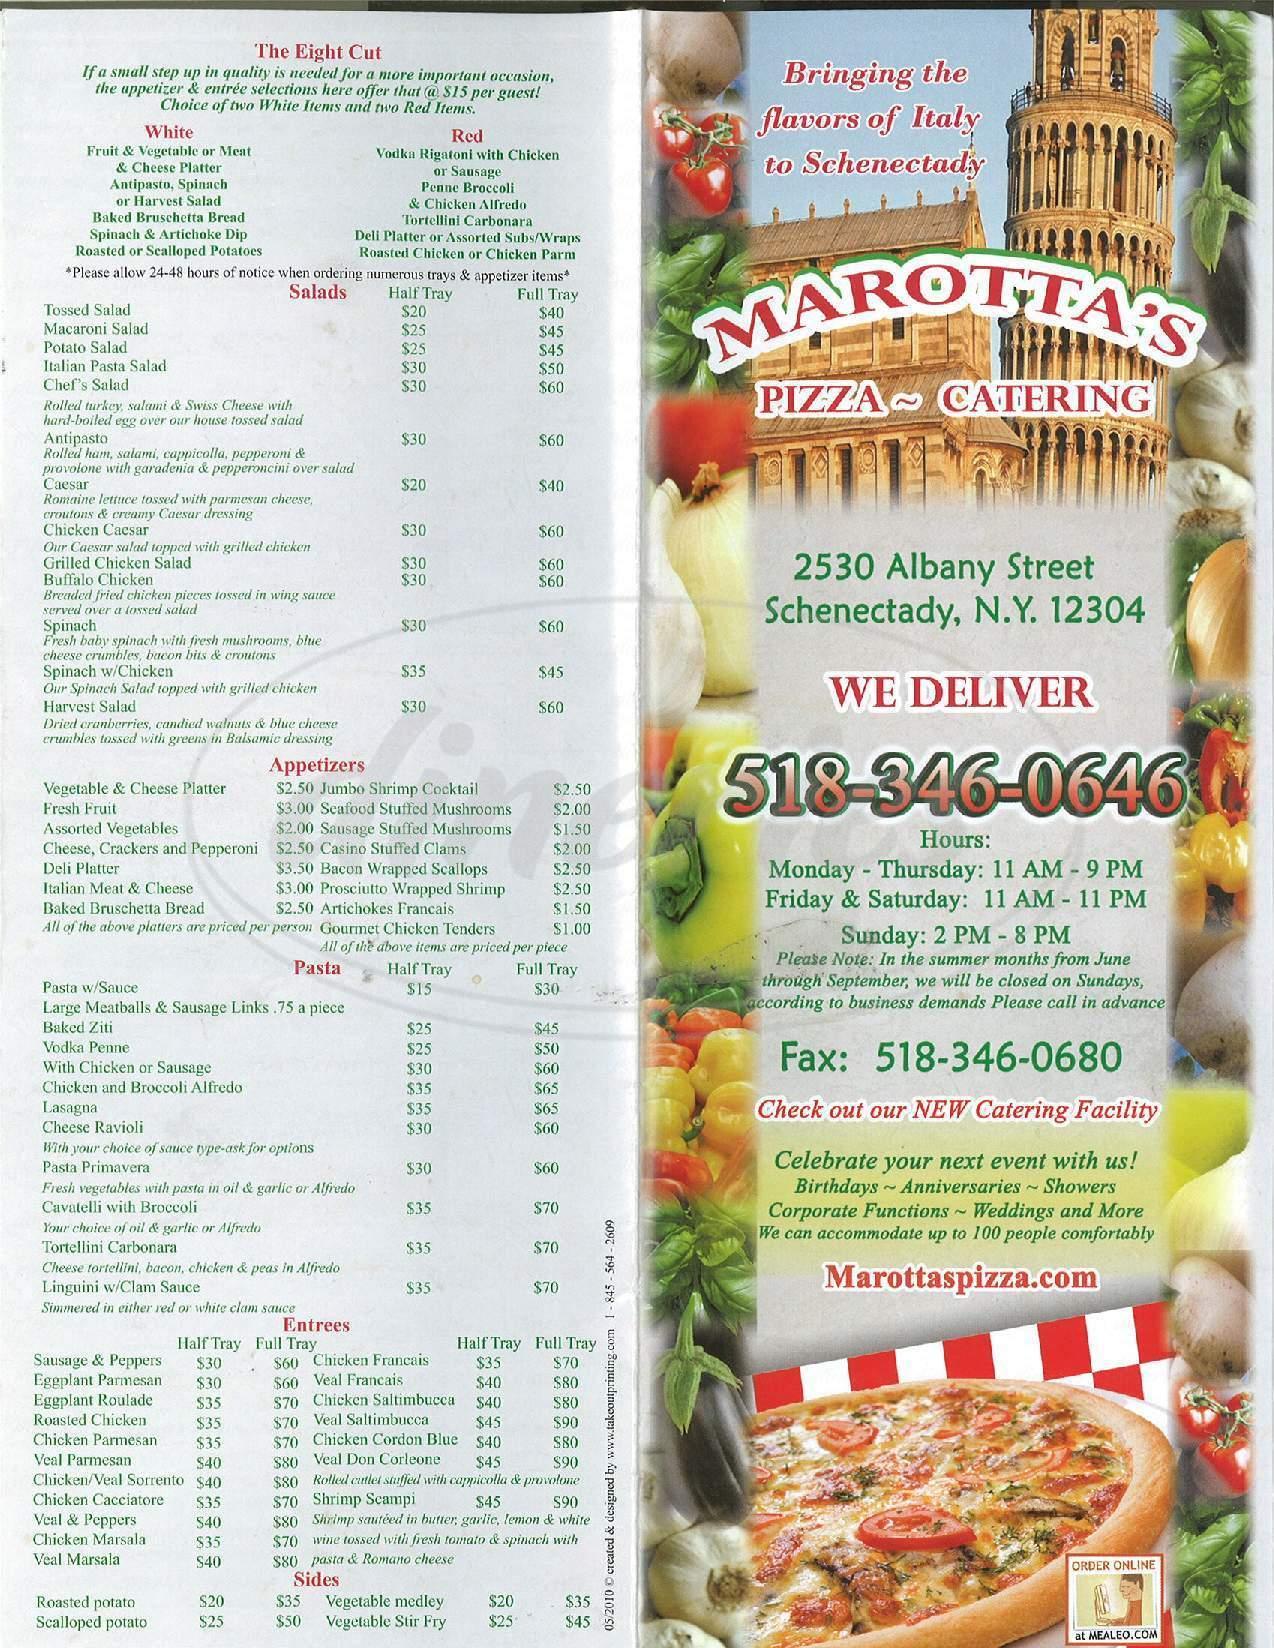 menu for Marottas Pizza & Catering